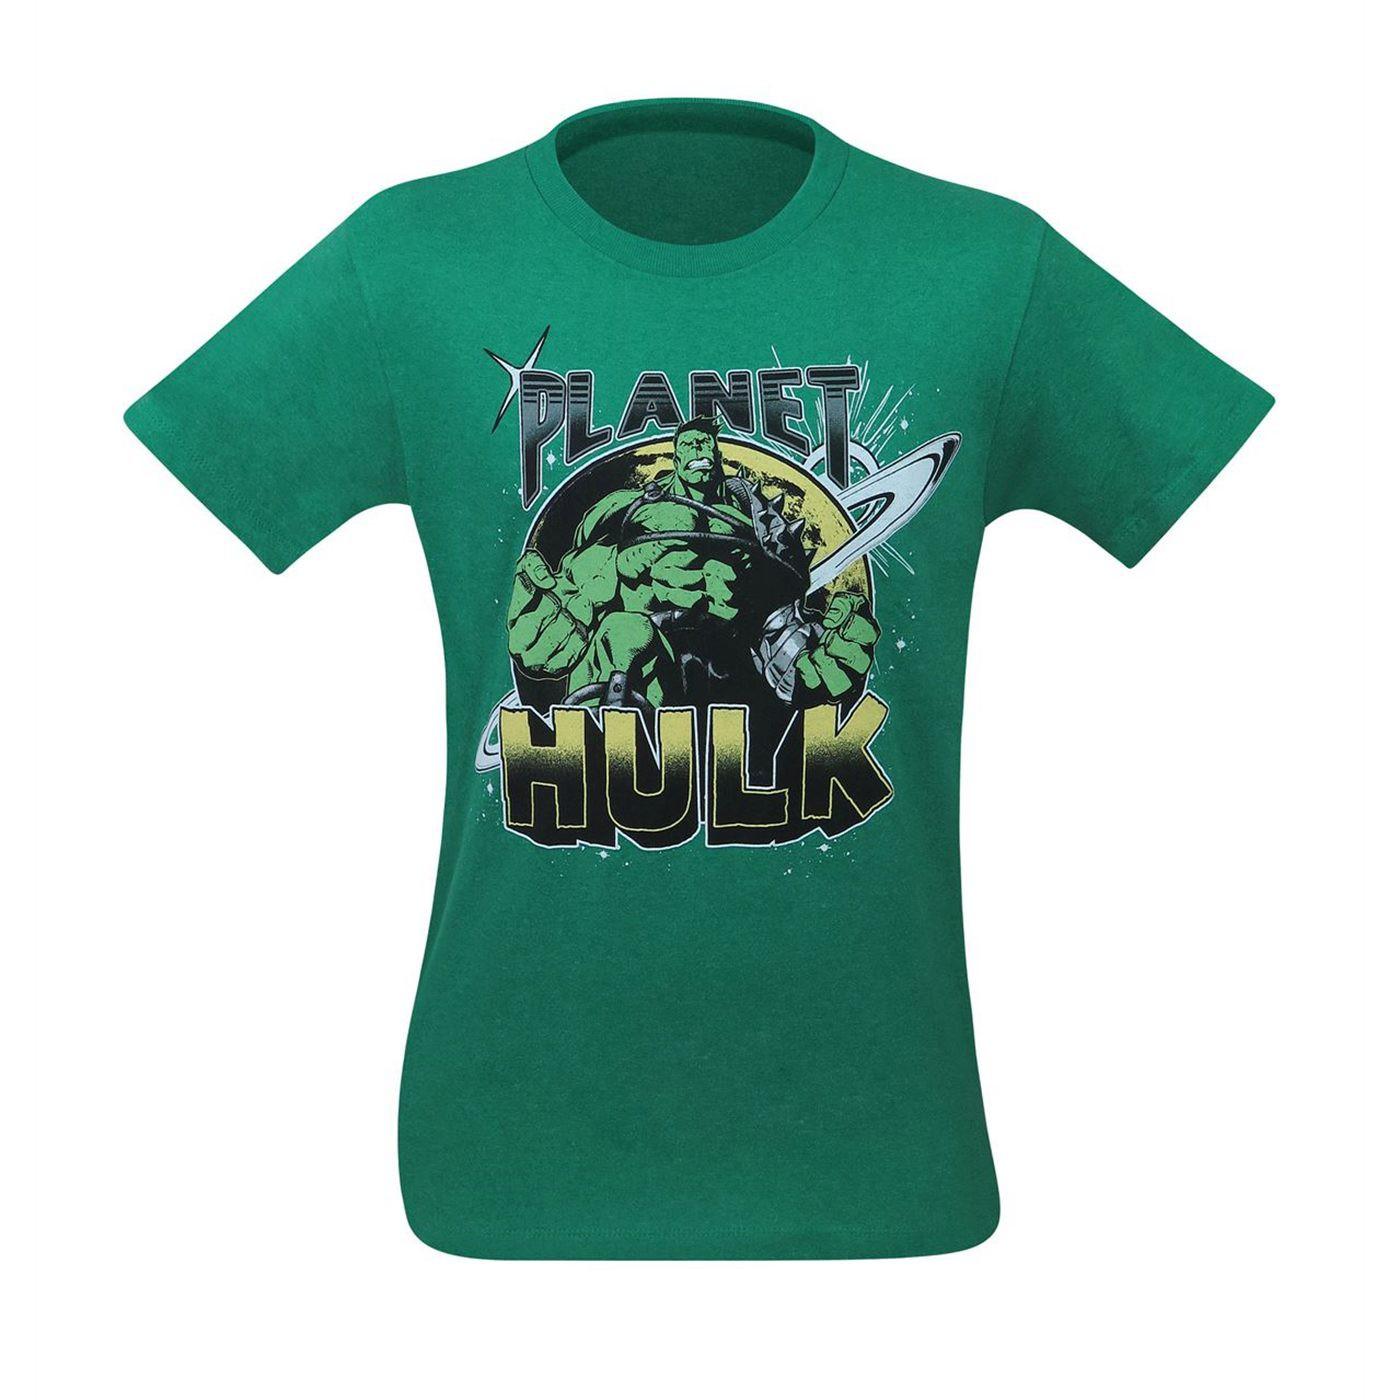 Planet Hulk Vintage Men's T-Shirt